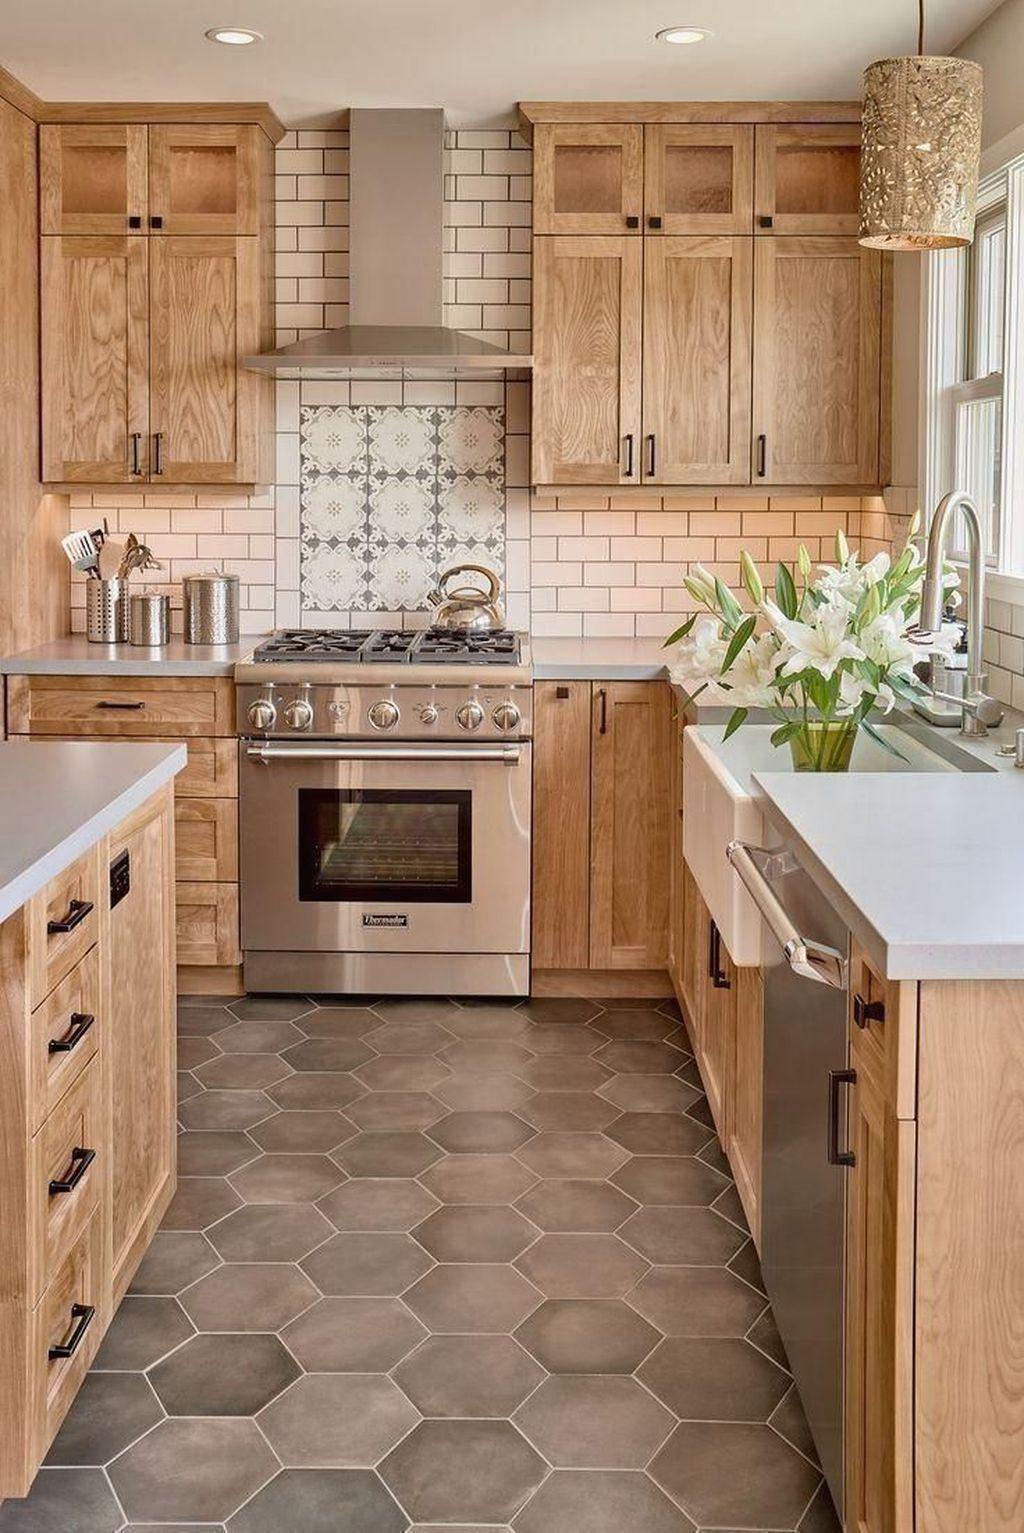 Nice Rustic Farmhouse Kitchen Cabinets Design Ideas 02 ... on Rustic:yucvisfte_S= Farmhouse Kitchen Ideas  id=62062